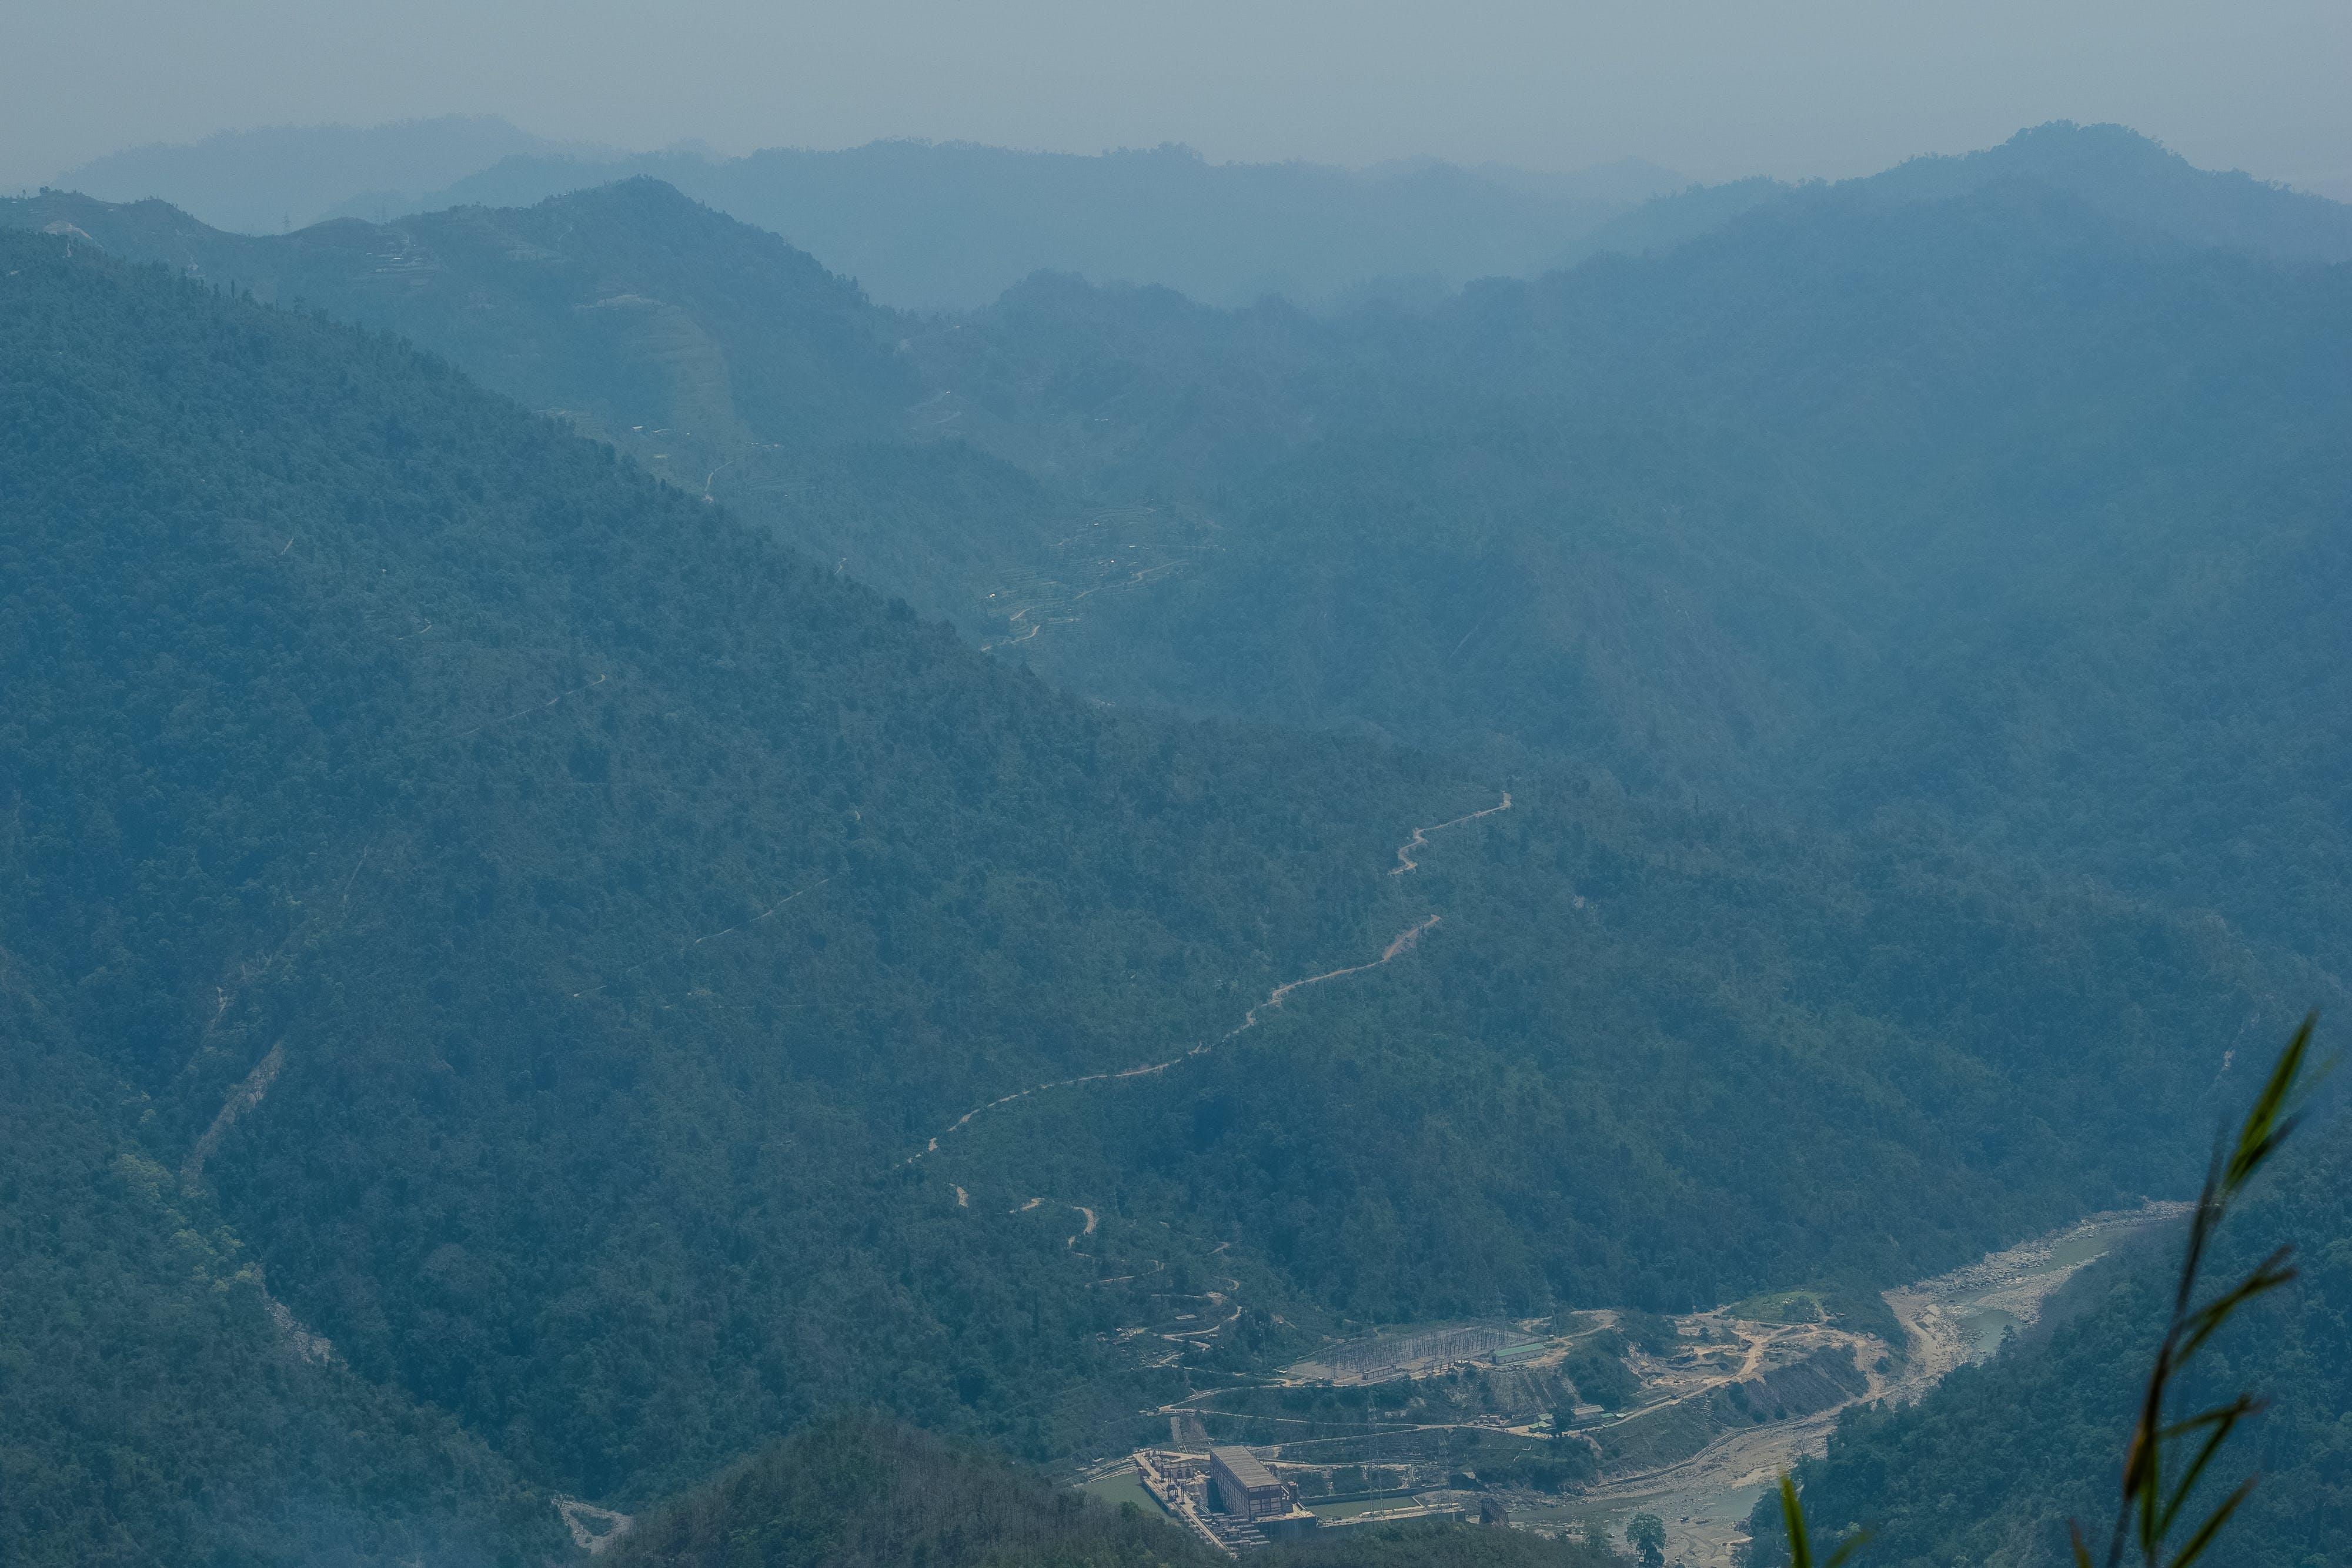 Kostenloses Stock Foto zu ahal dhara view point, berg, fluss, hügel